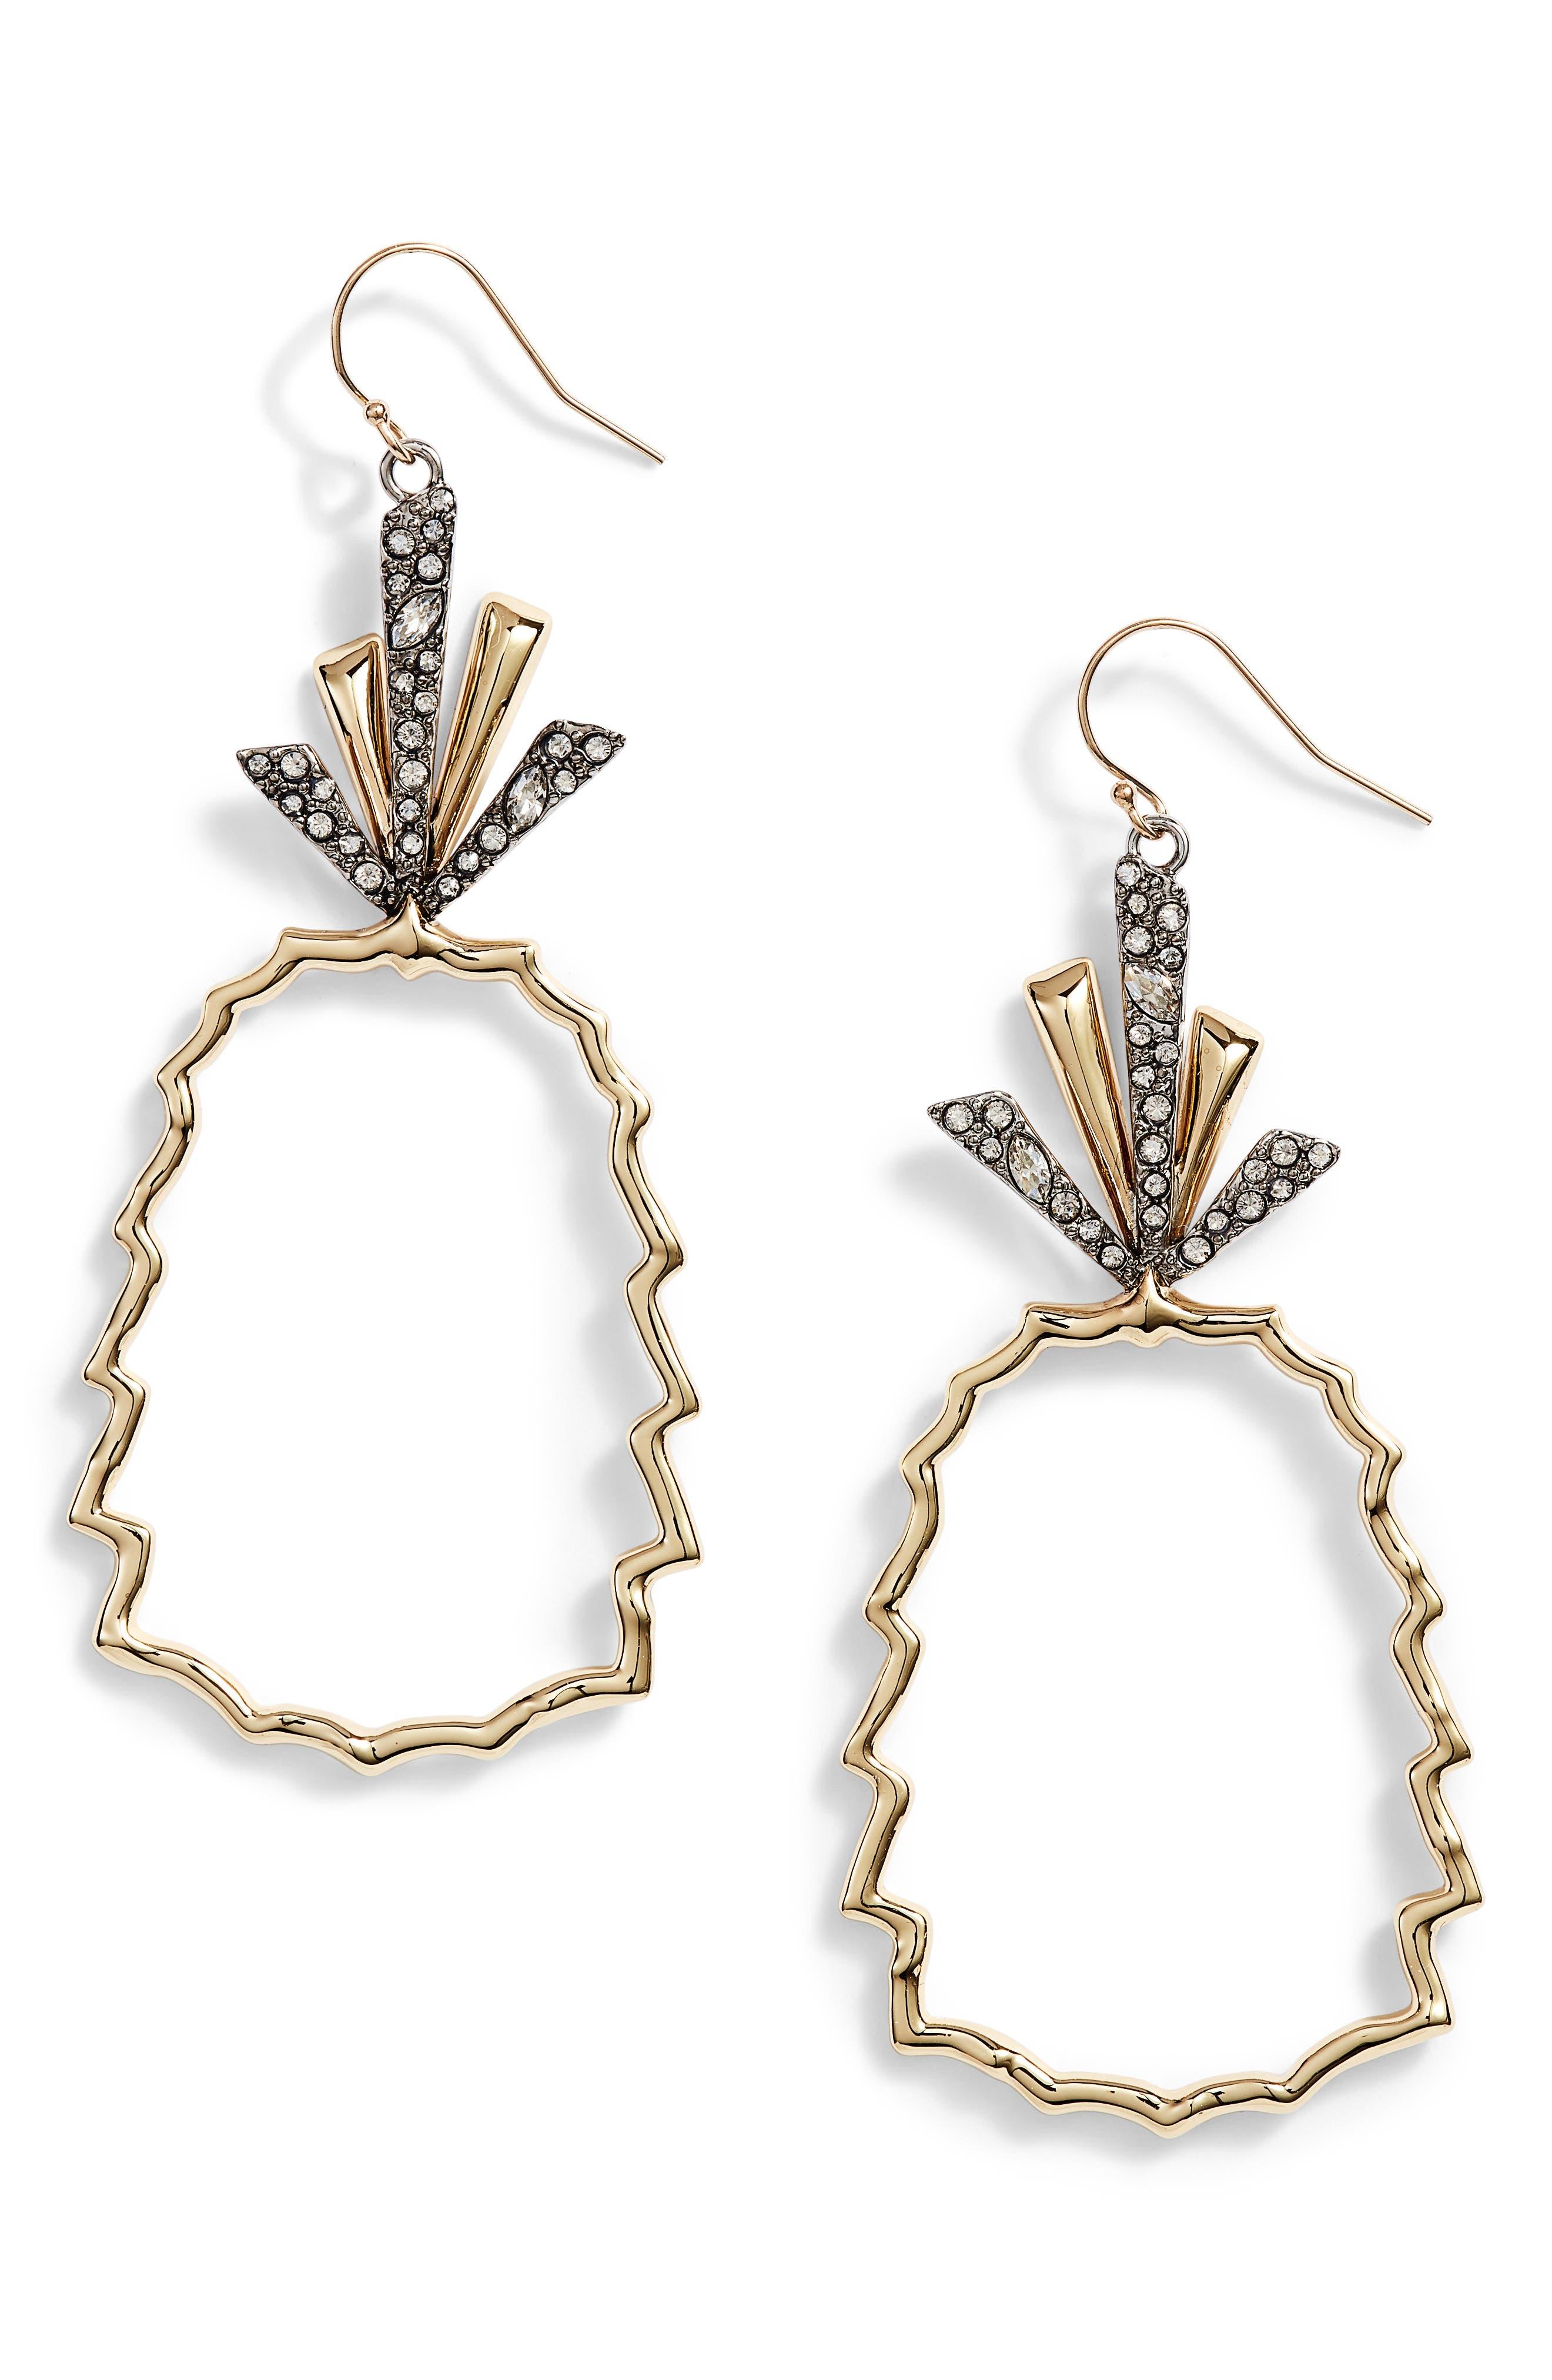 Crystal Leaf Pineapple Earrings,                             Main thumbnail 1, color,                             GOLD